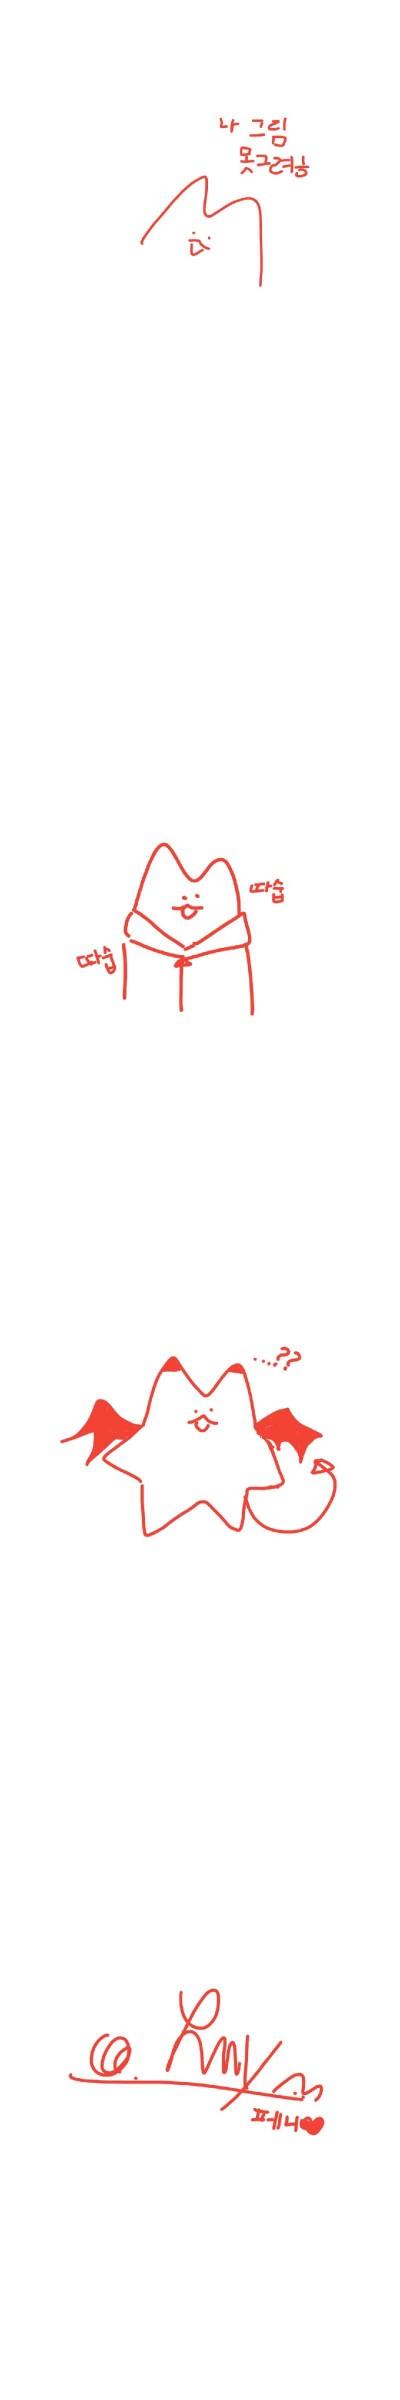 fny- 한정판(?) 캐릭컬렉션 [퍼가기가능]   fny-   Digital Drawing   PENUP